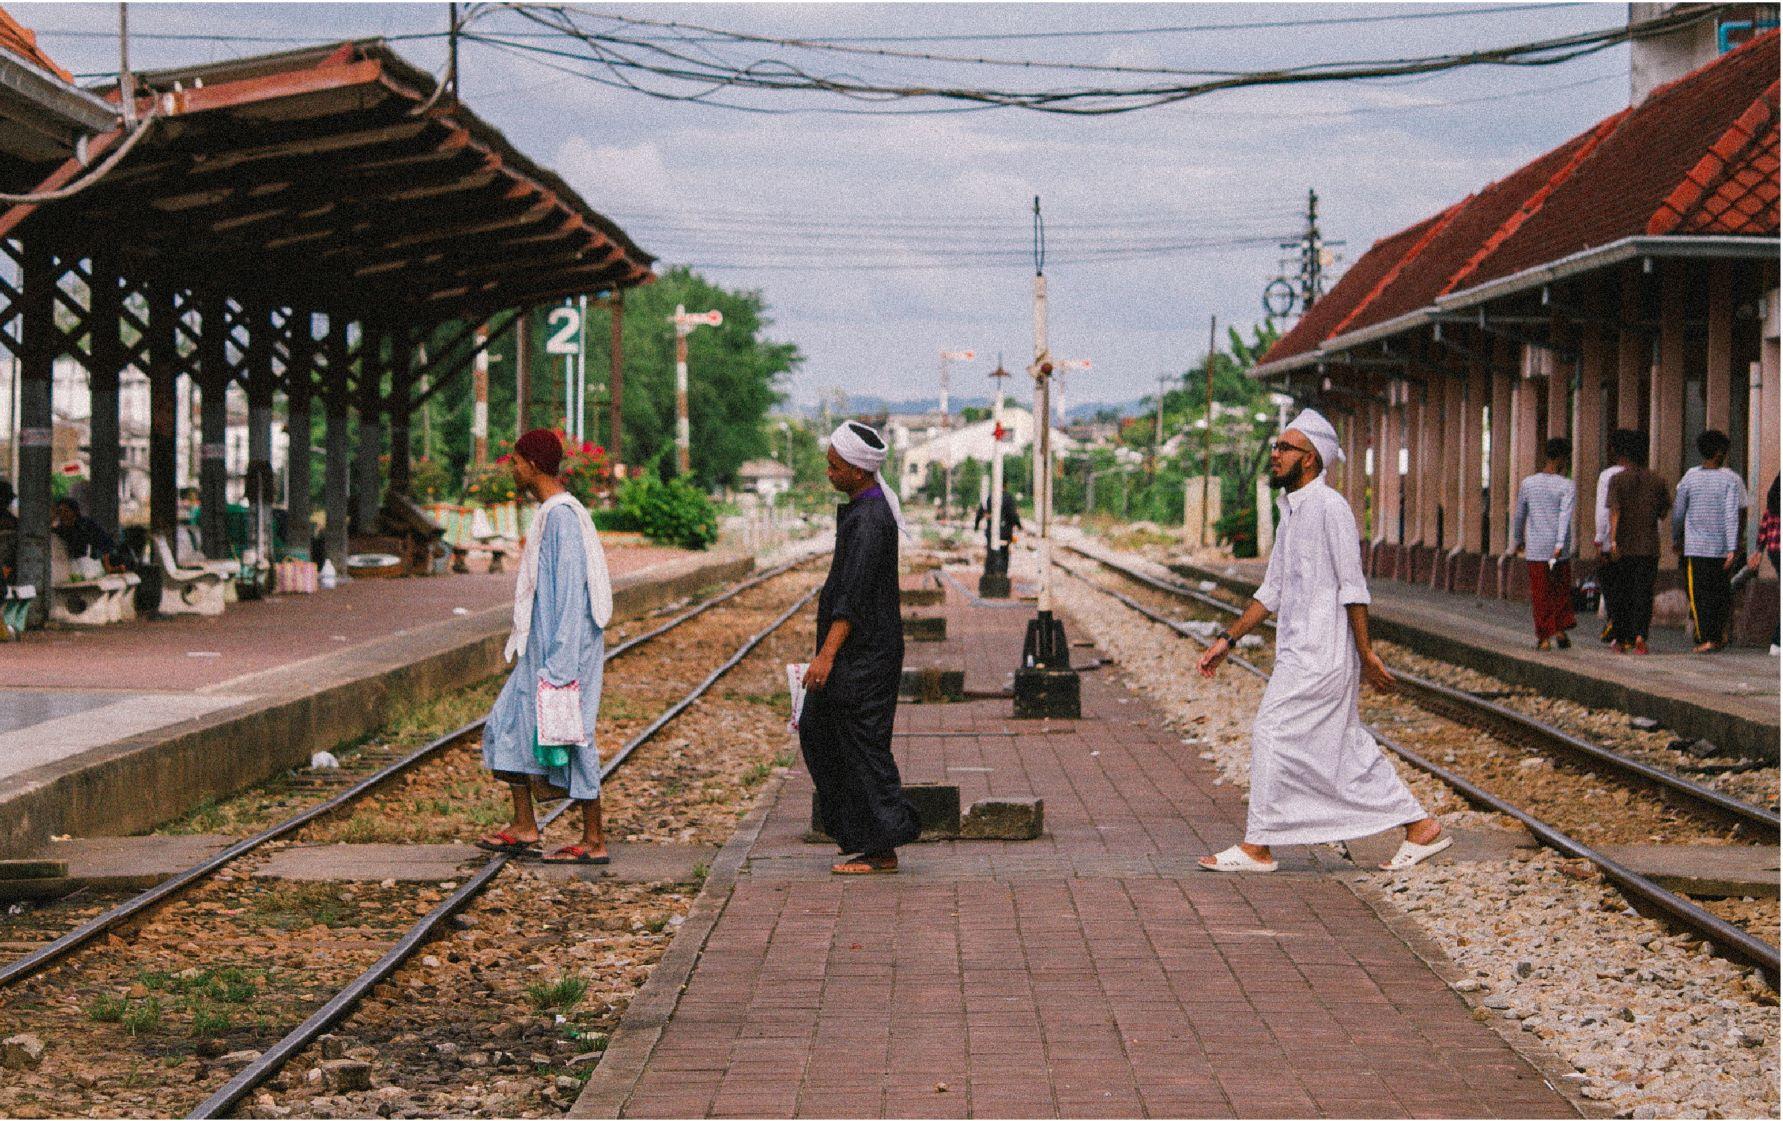 Photo of Islamic men crossing street